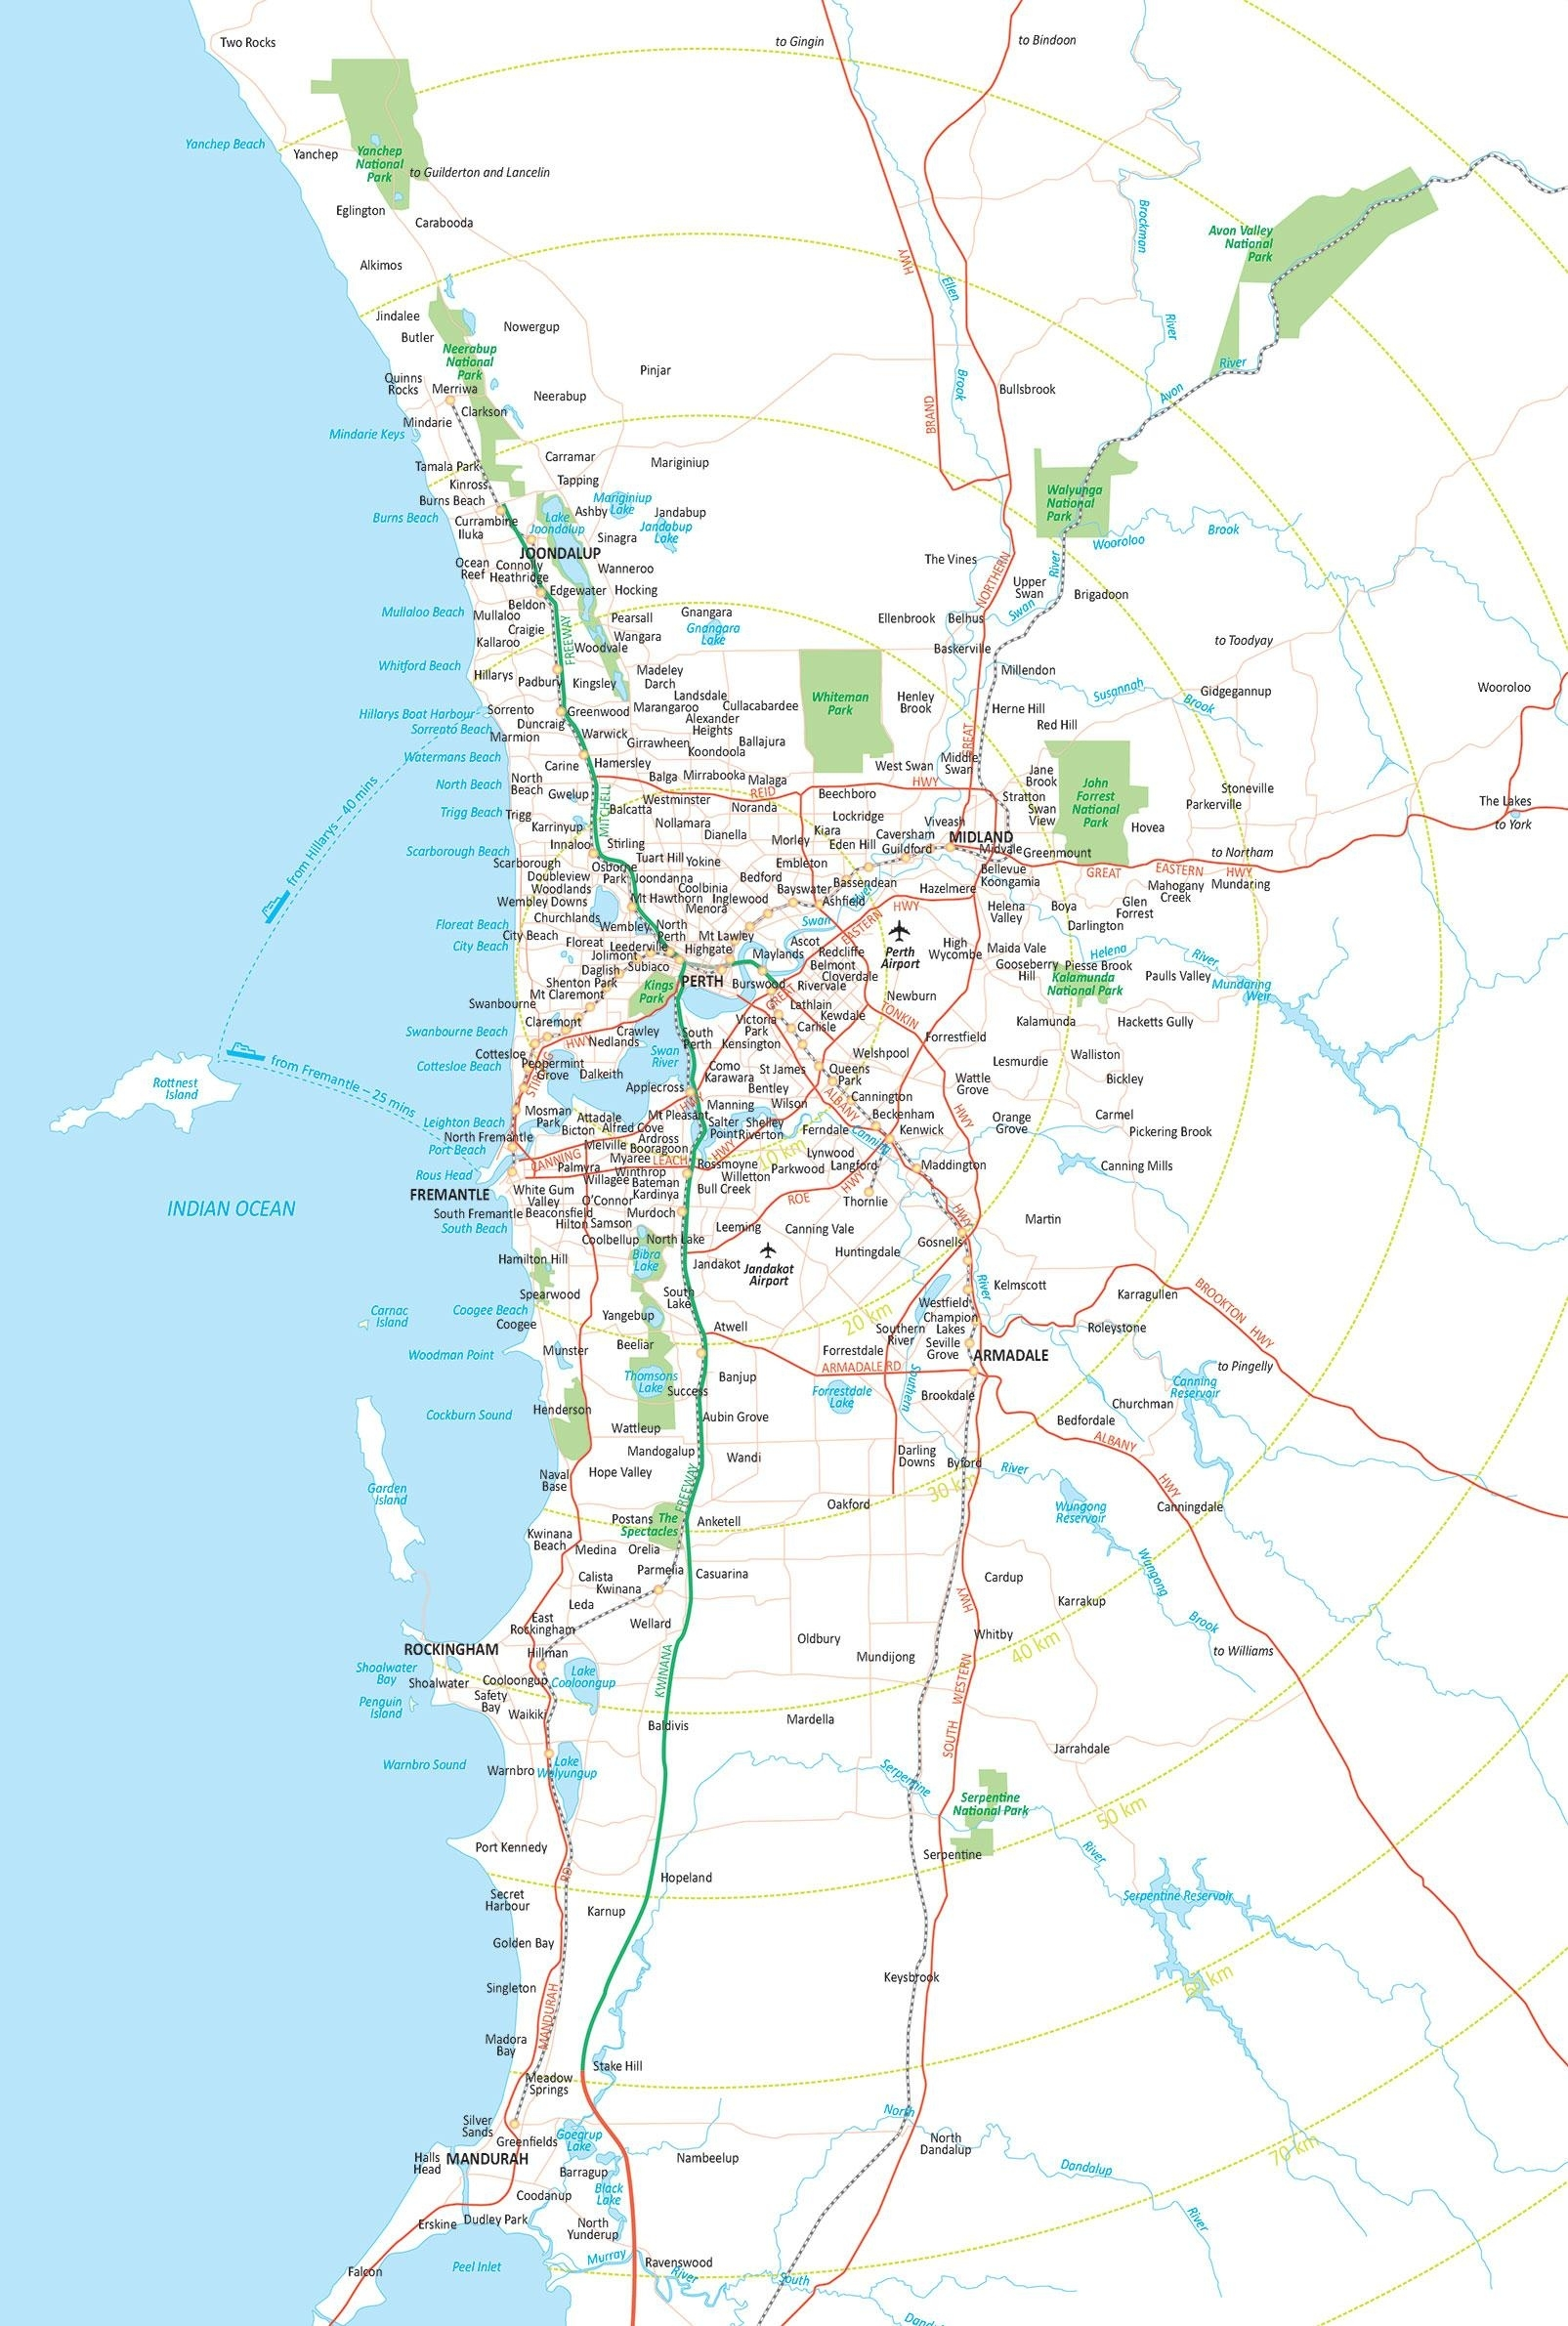 Perth Map Suburbs - Map Of Perth Suburbs (Australia) pertaining to Map Of Perth Australia Suburbs